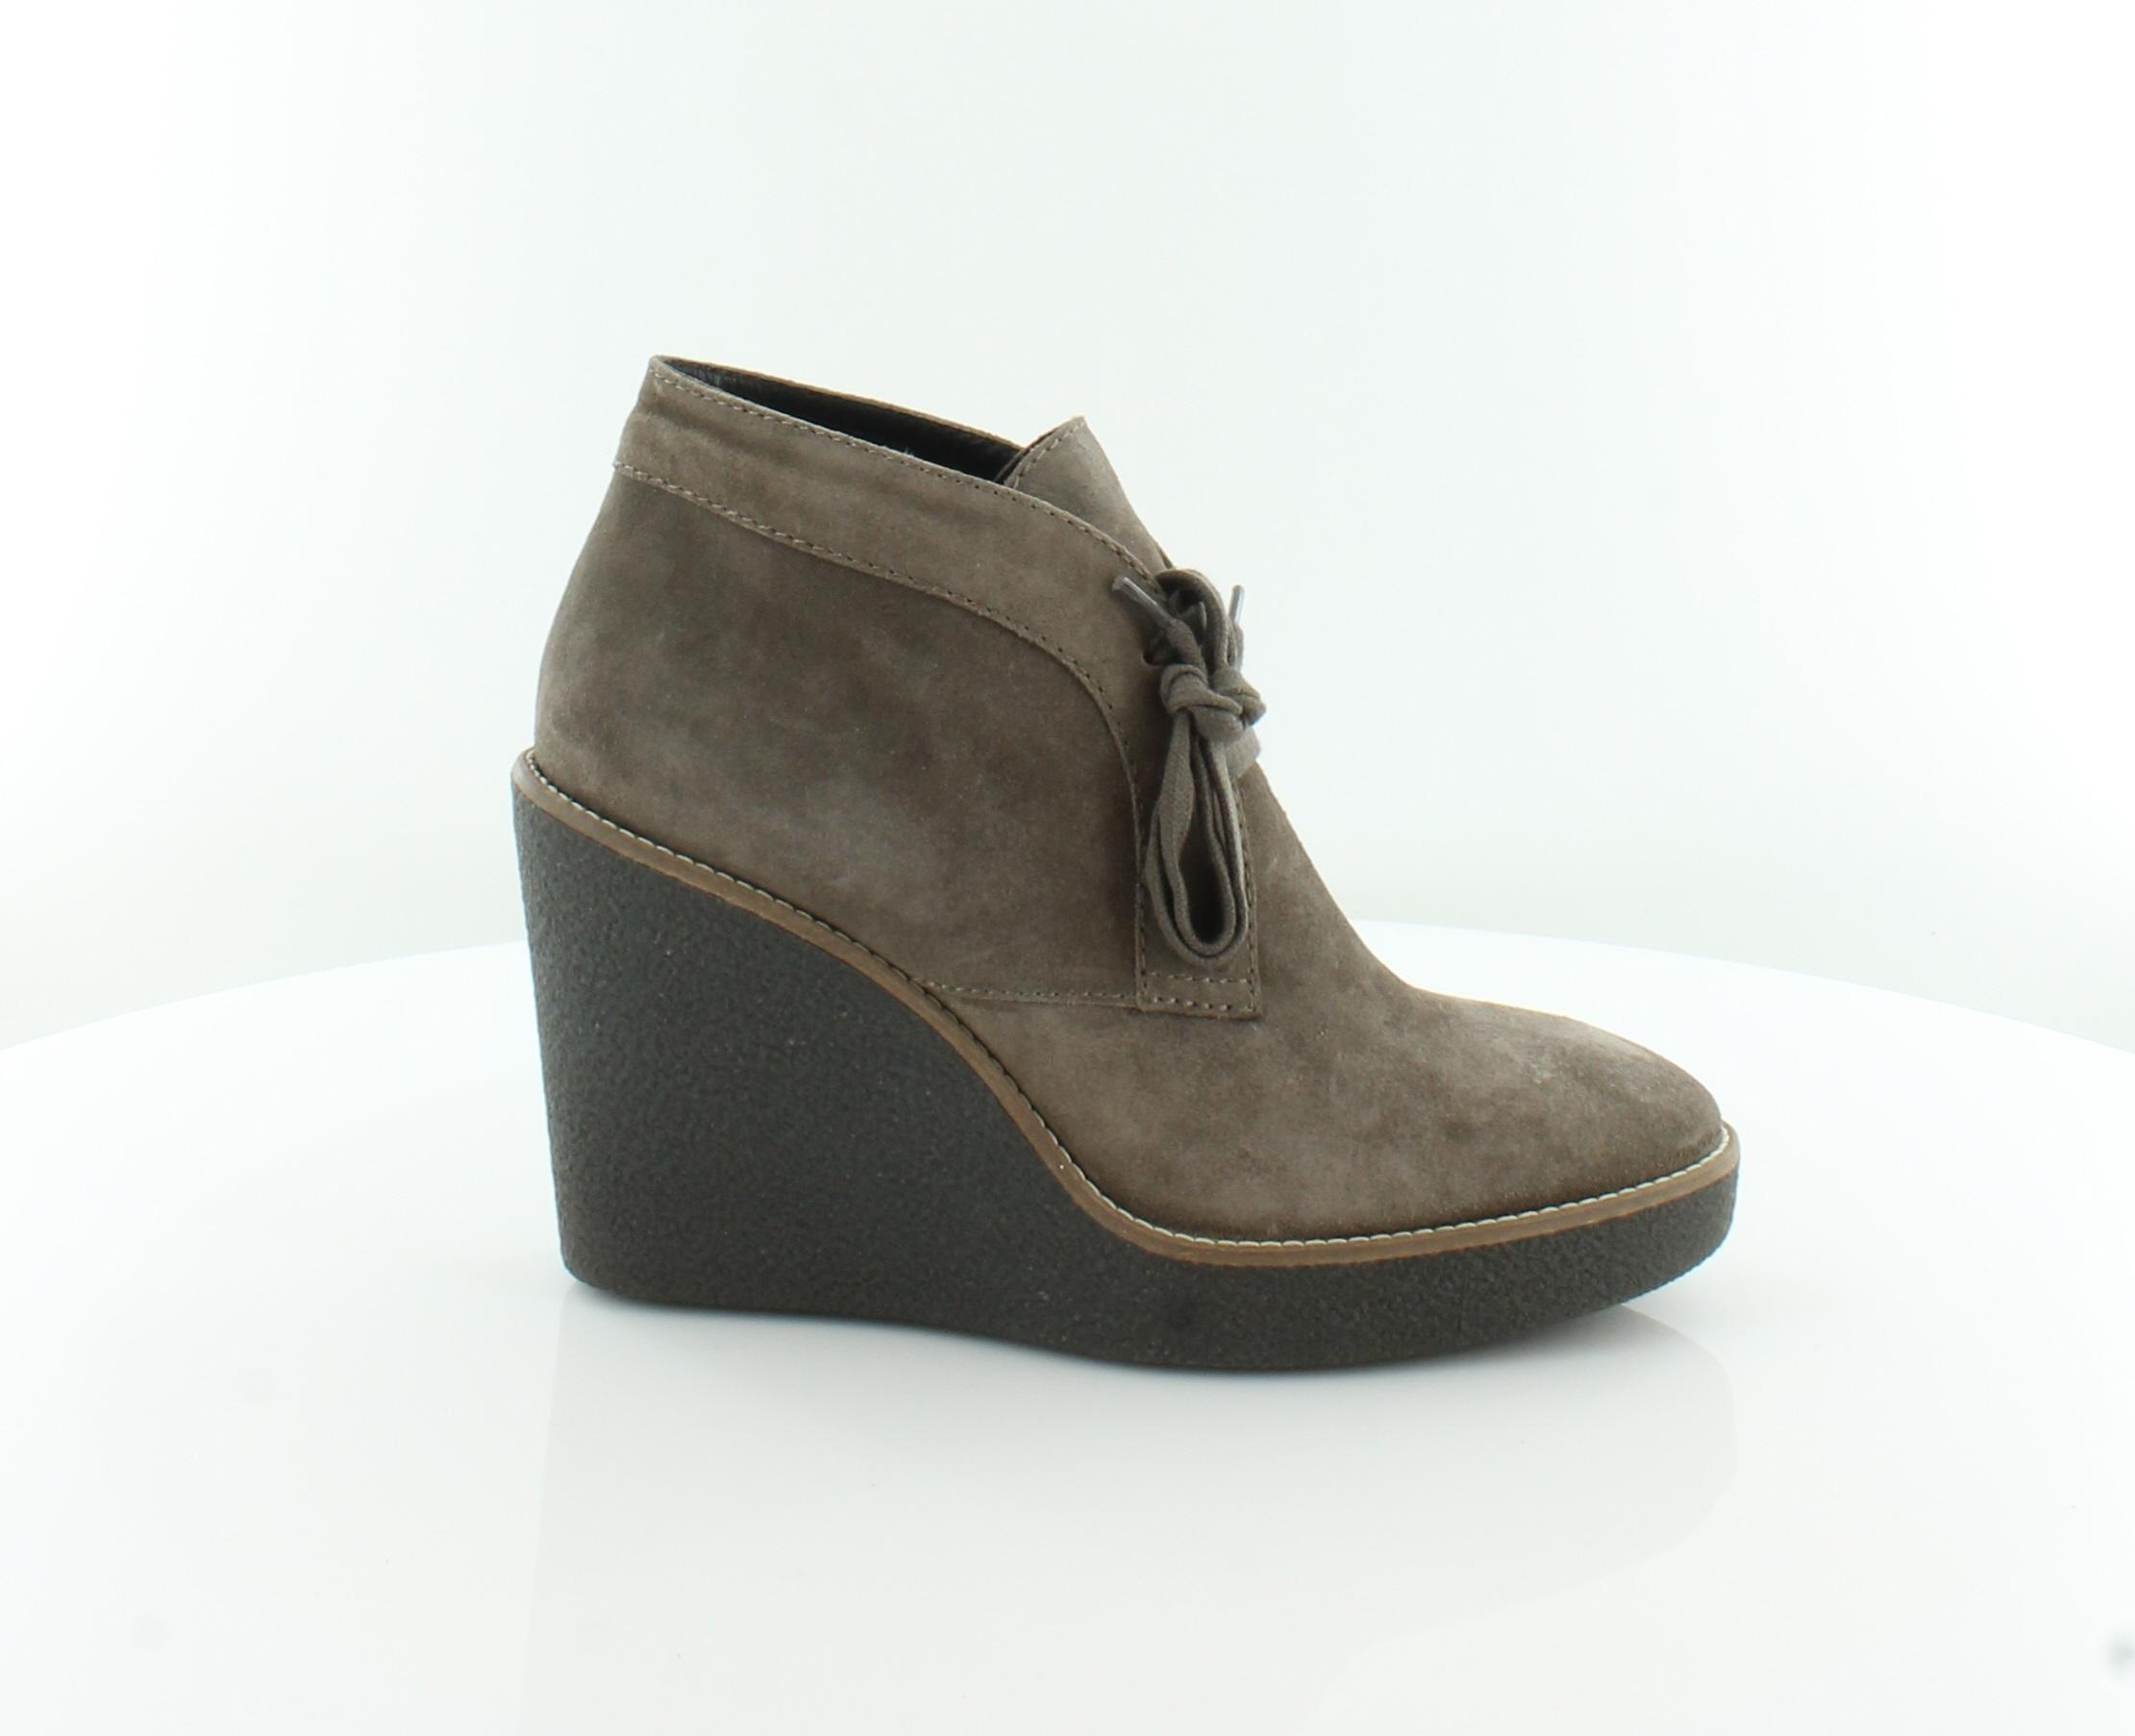 8d049c91daf1 Aquatalia-Vianna-Women-039-s-Boots-Taupe thumbnail 1